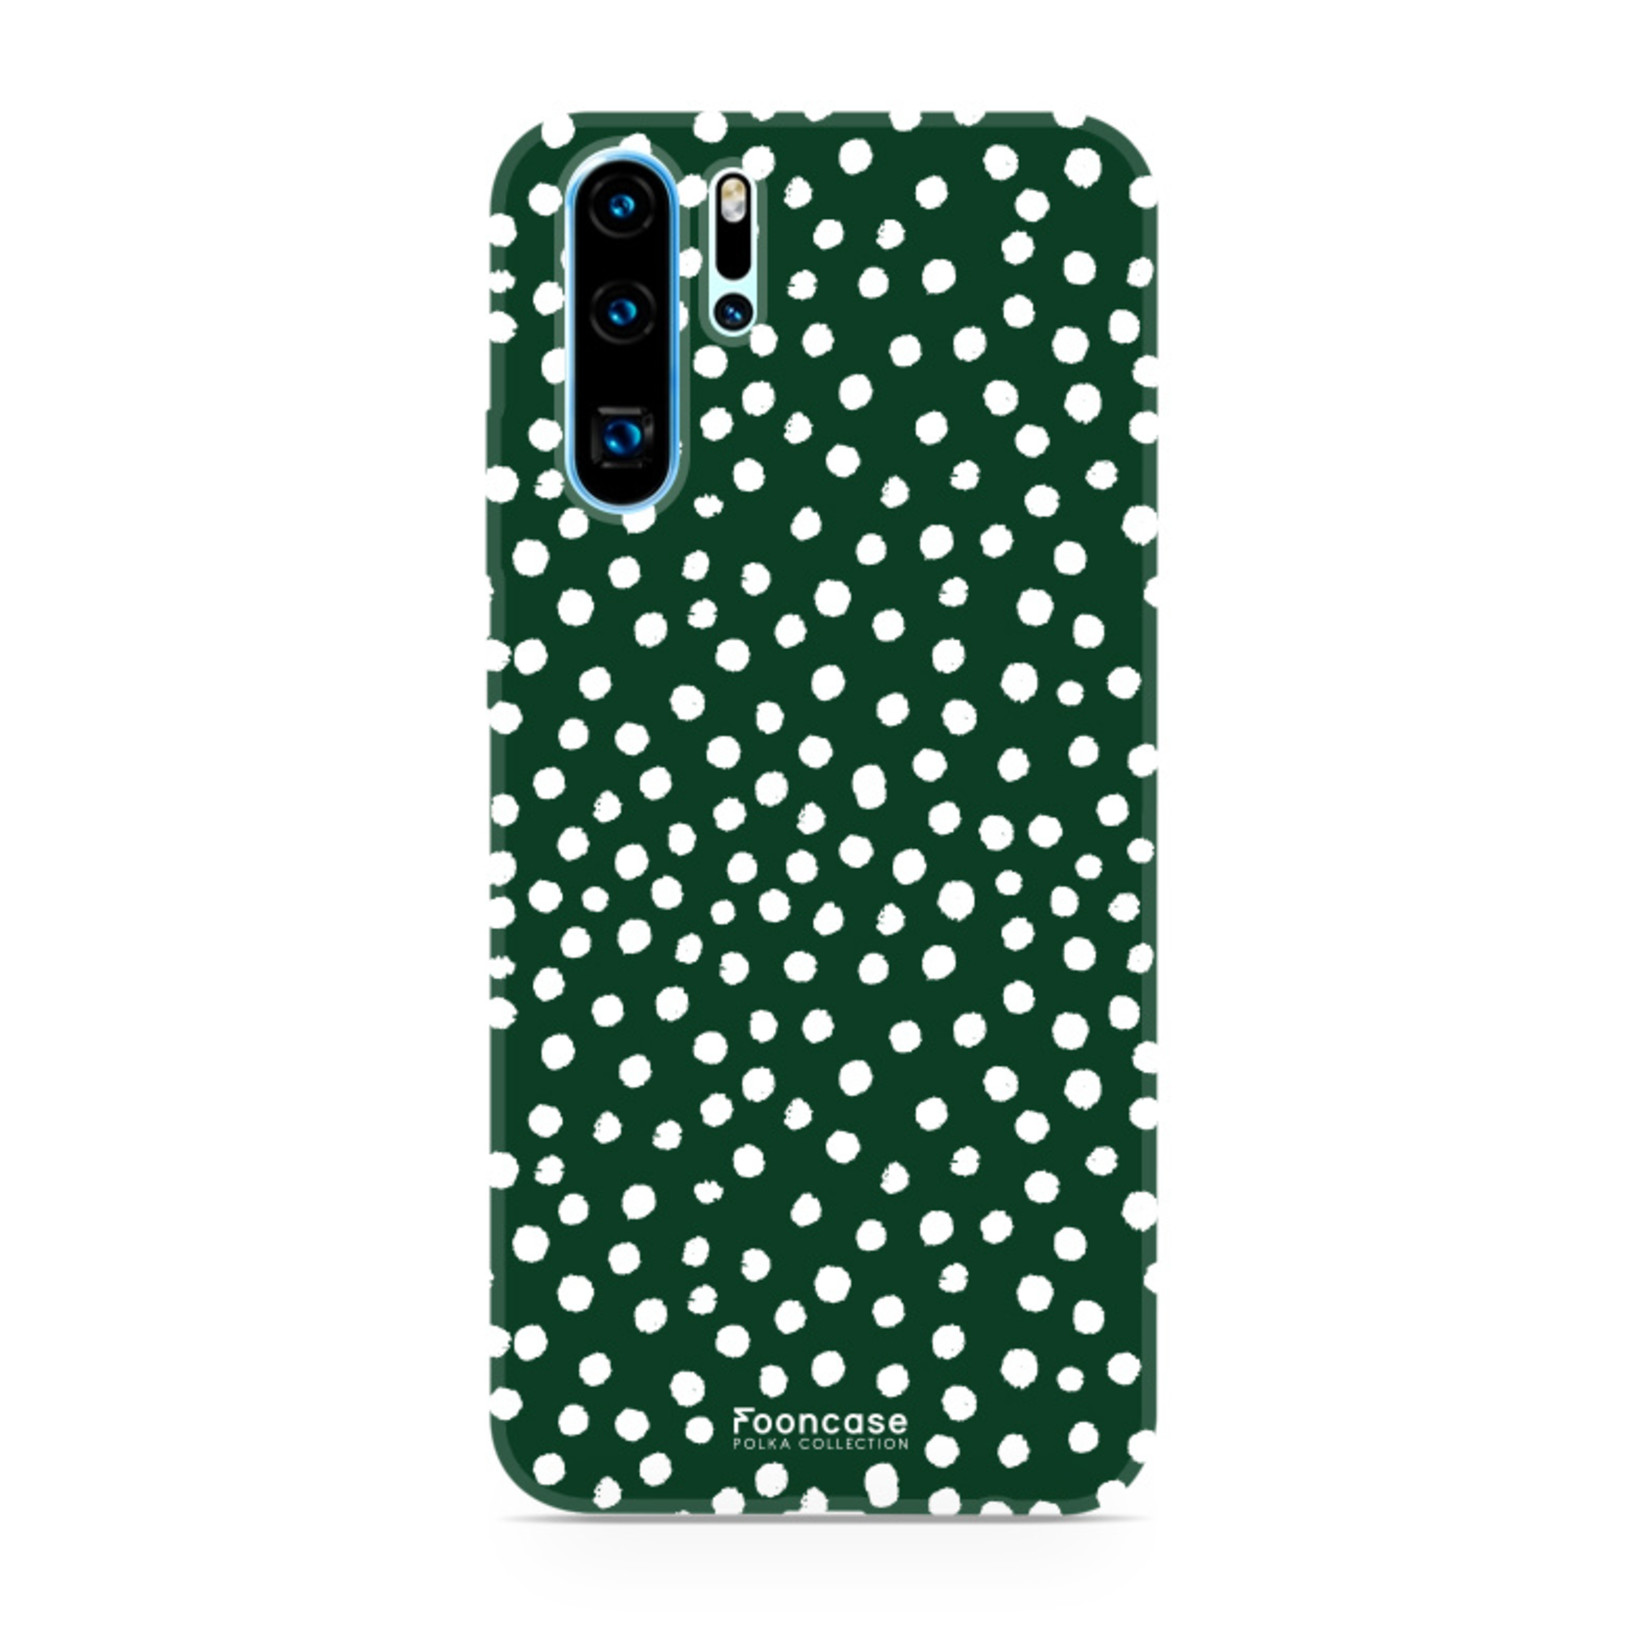 FOONCASE Huawei P30 Pro hoesje TPU Soft Case - Back Cover - POLKA COLLECTION / Stipjes / Stippen / Groen